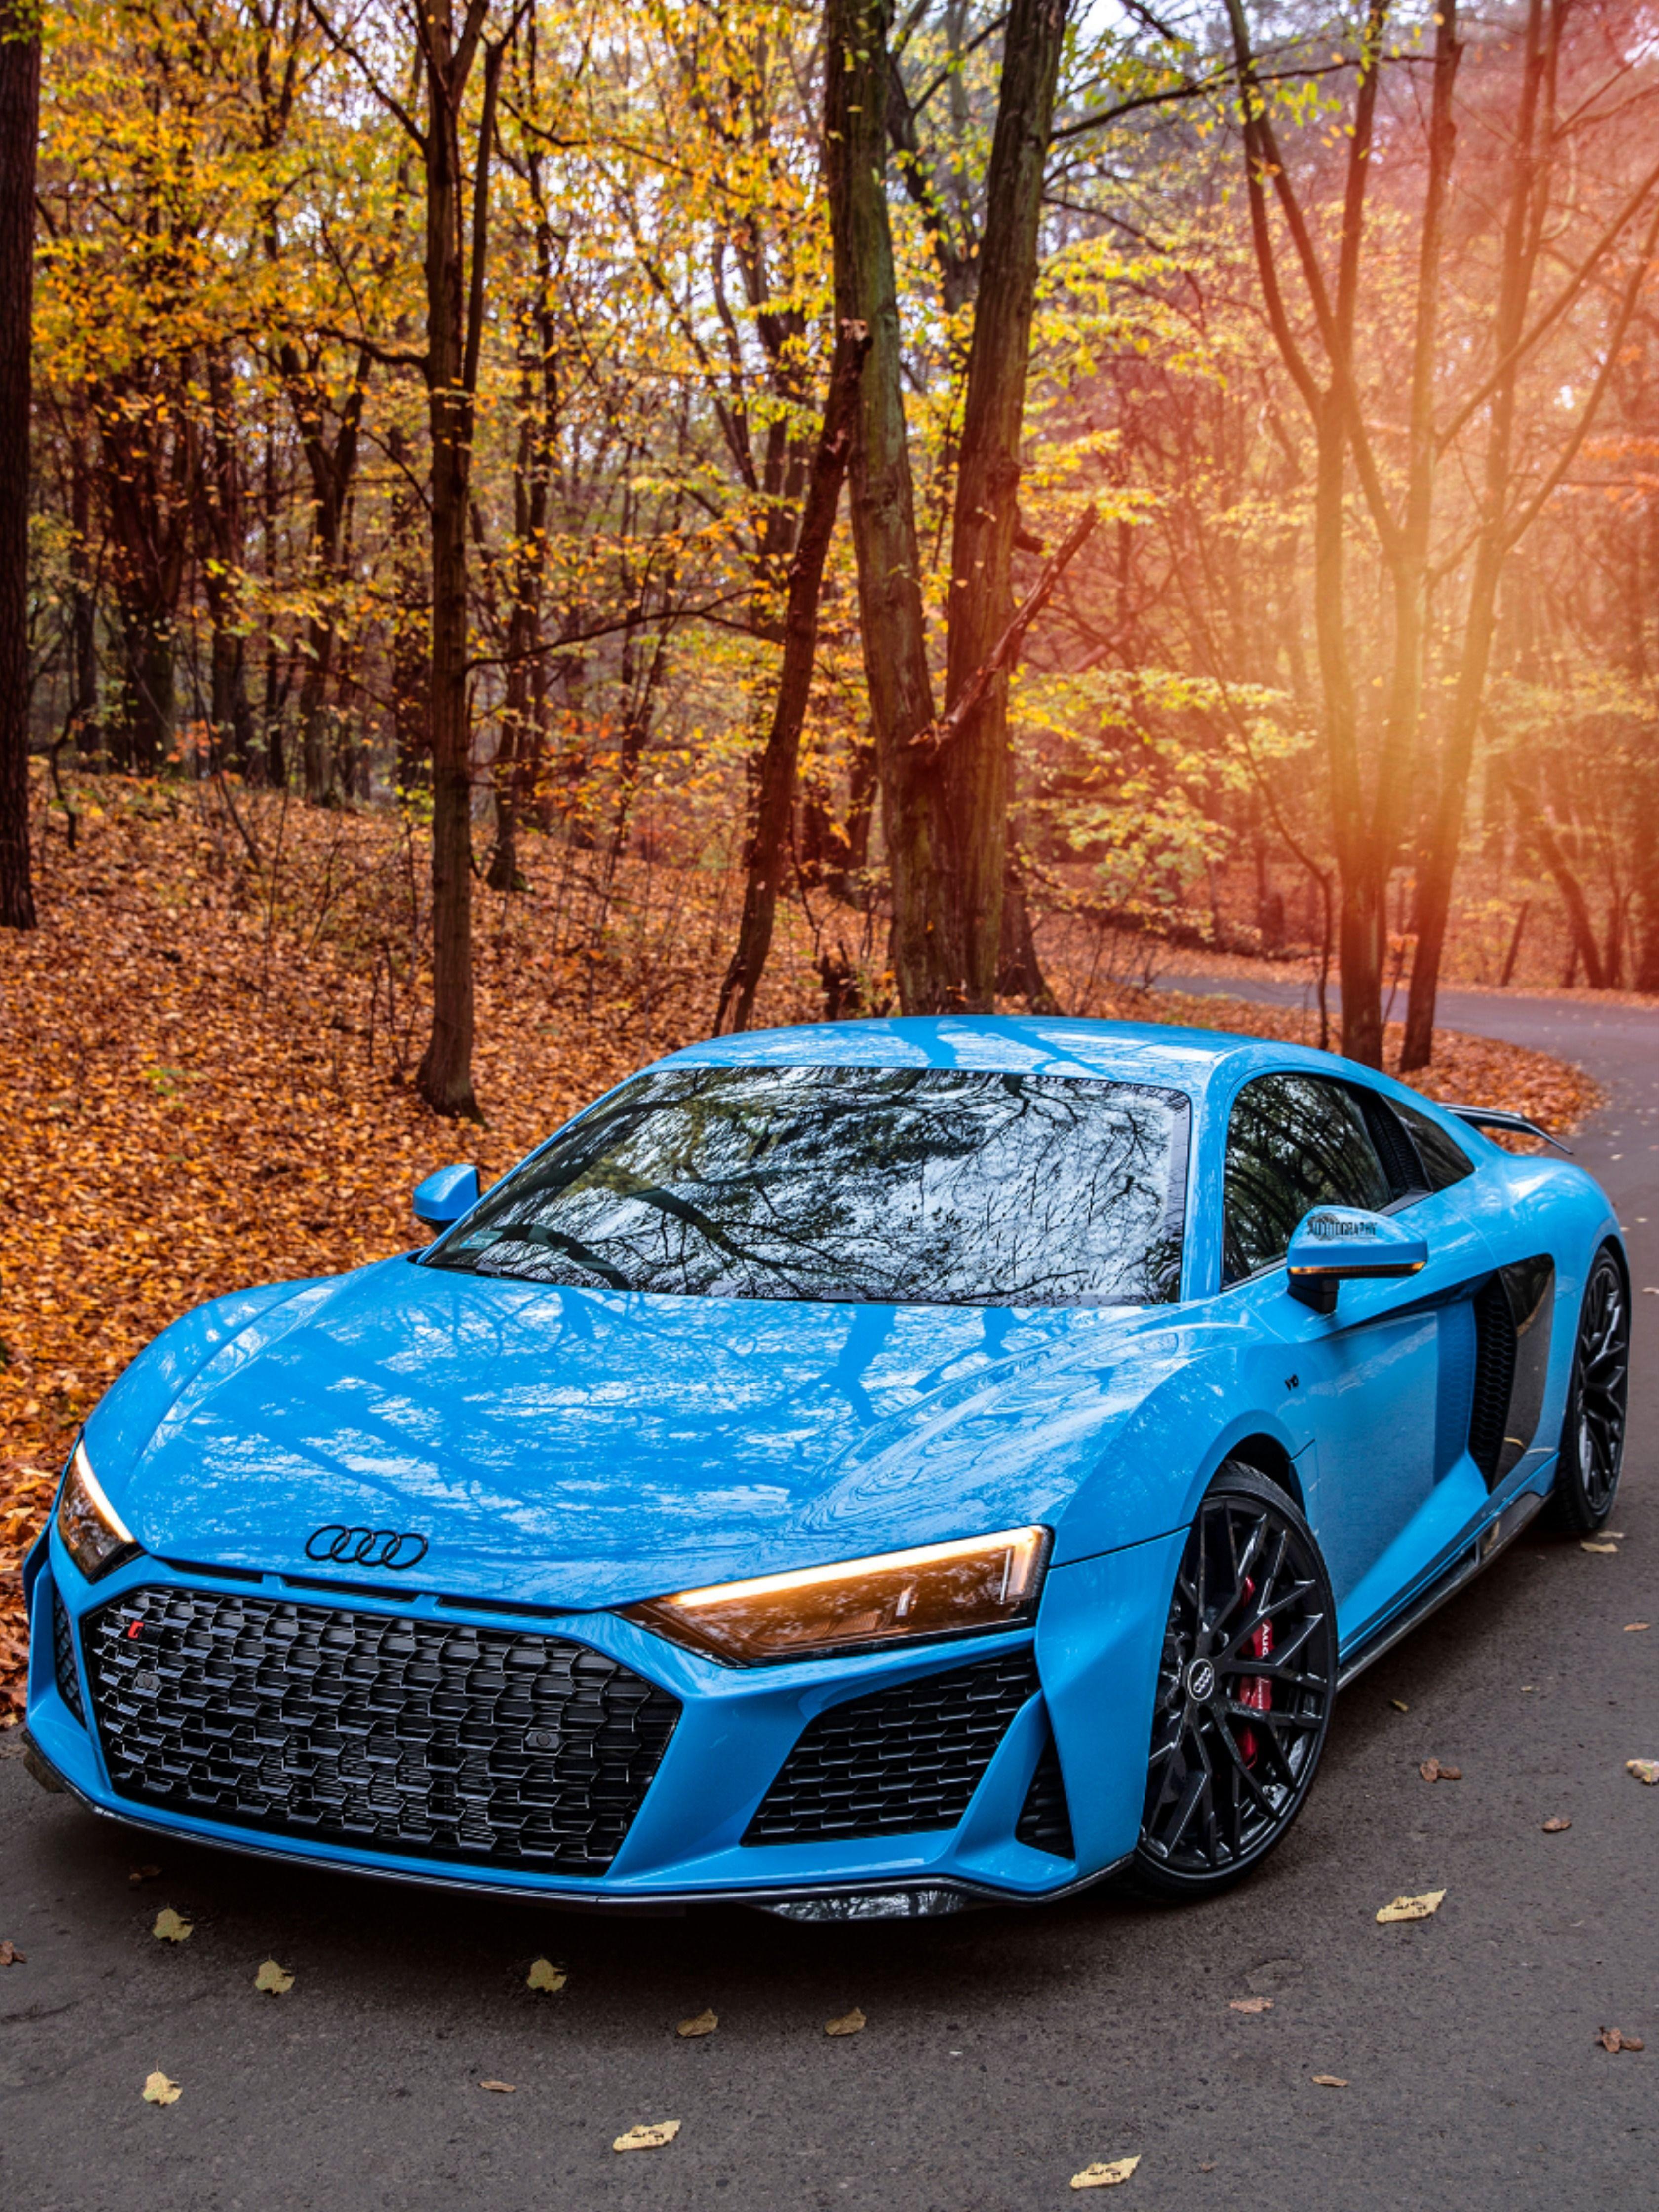 Audi R8 Coupe V10 Performance Quattro Covered In Blue Audi R8 Audi Audi Cars